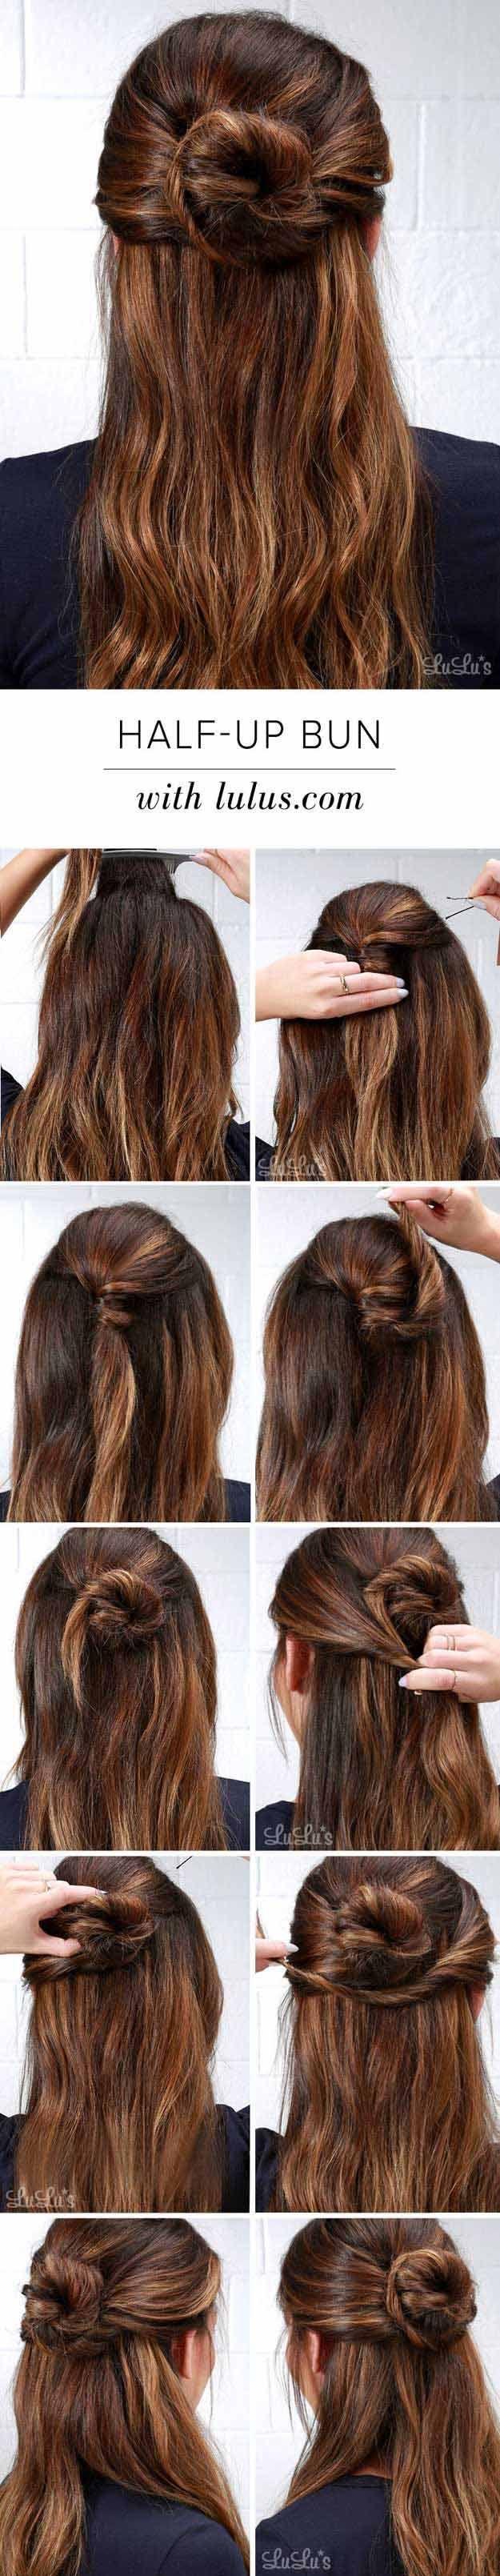 1628 best medium hair images on Pinterest